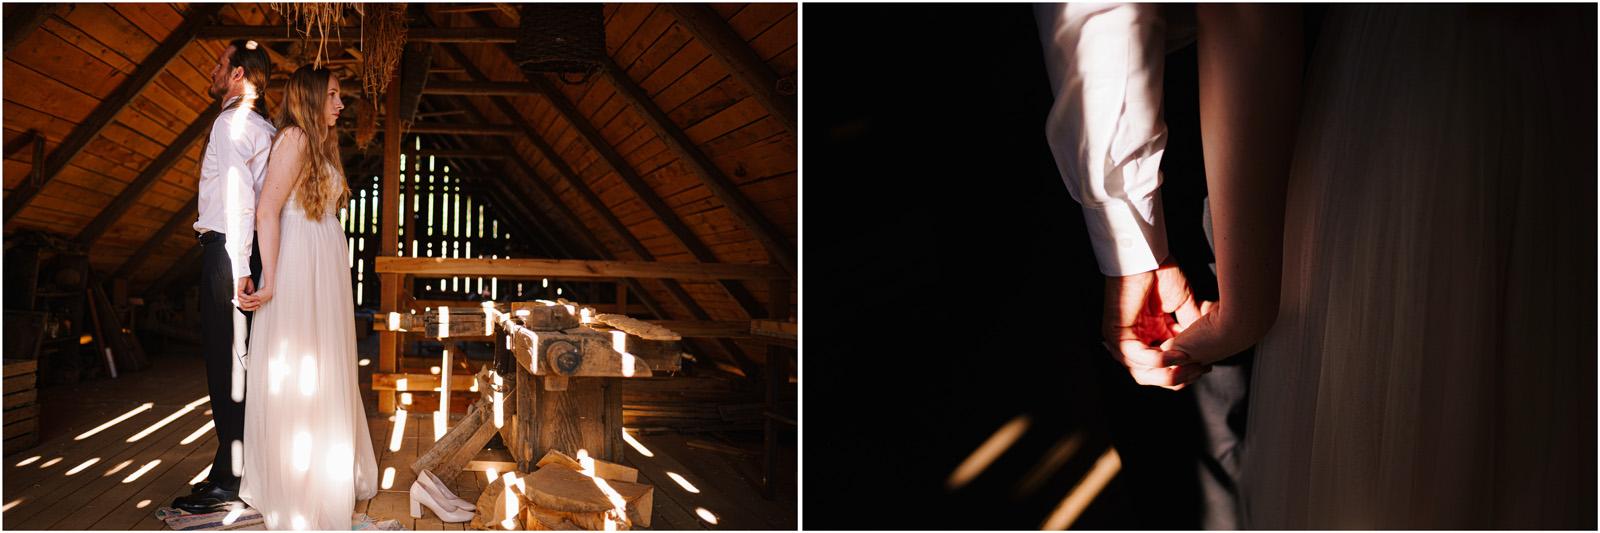 Ewelina & Seweryn | rustykalna sesja w stodole 10